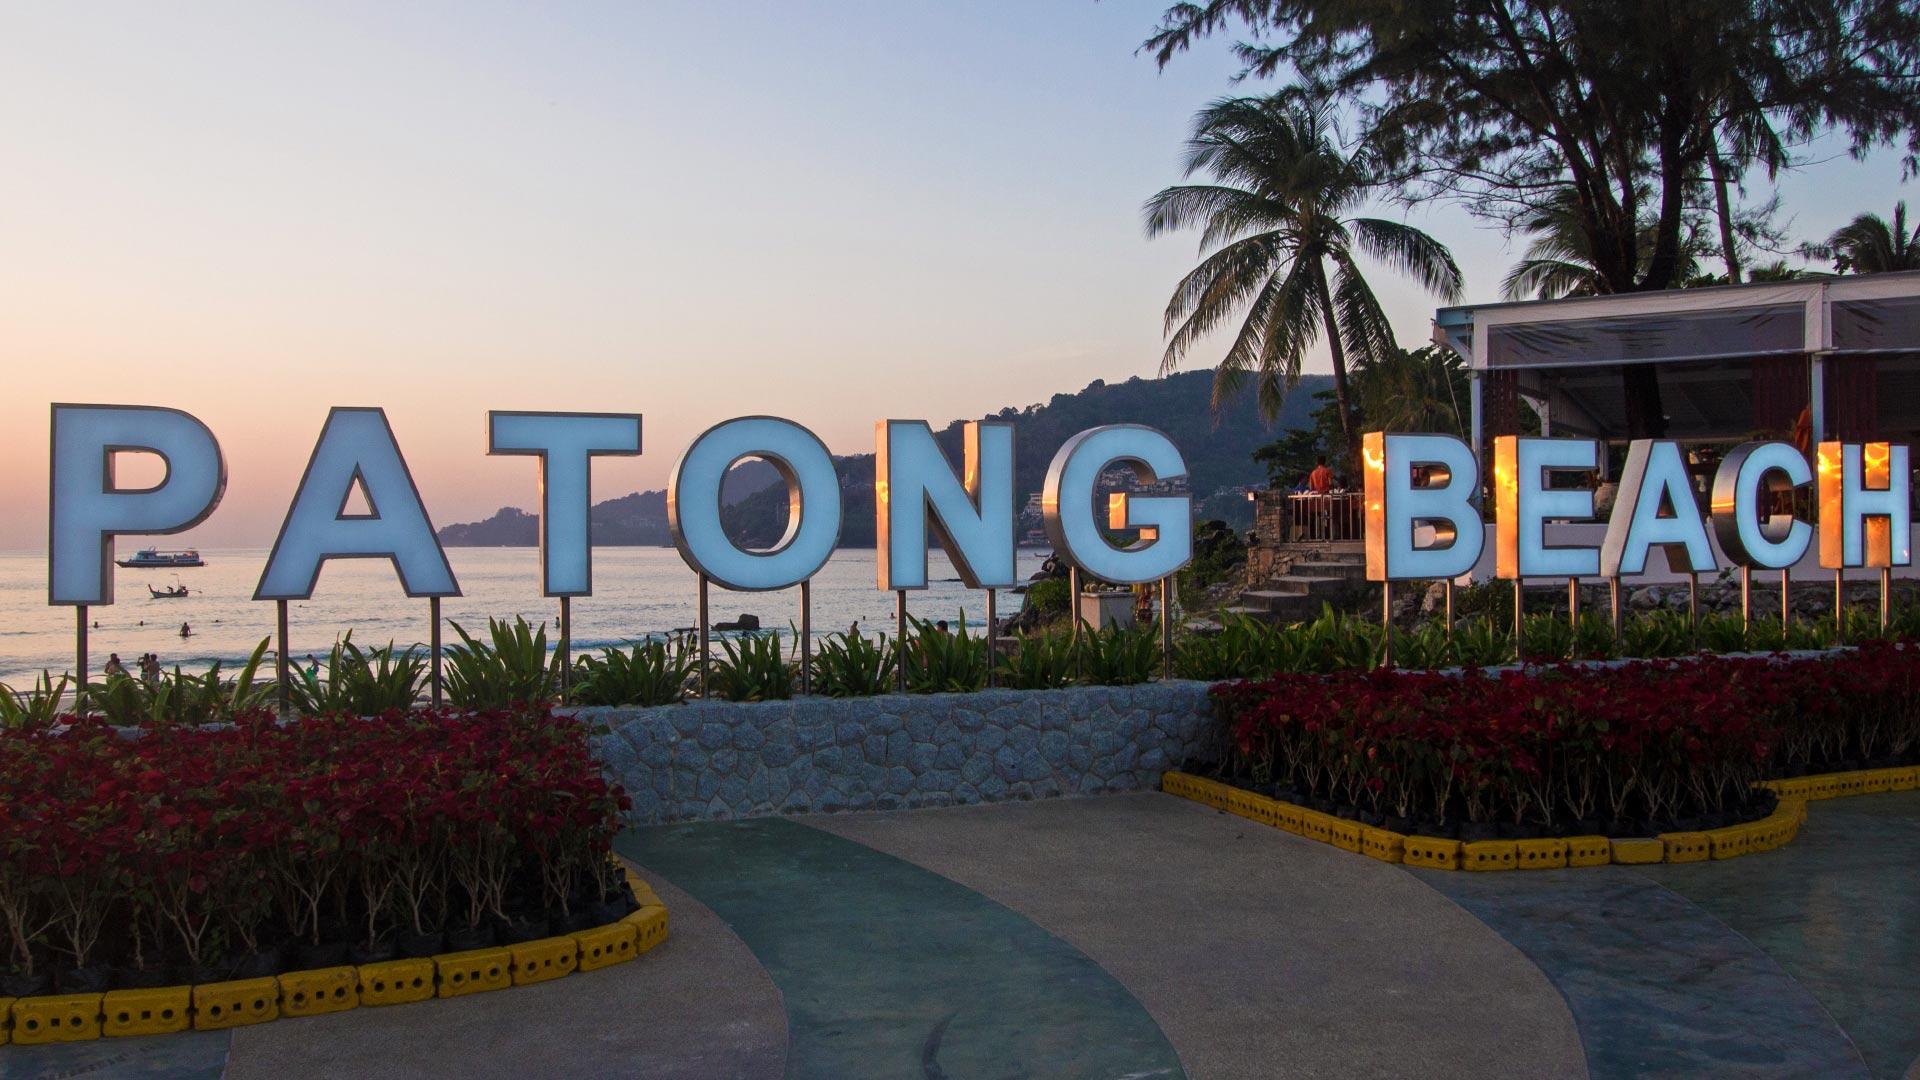 patong beach bestfynd.com